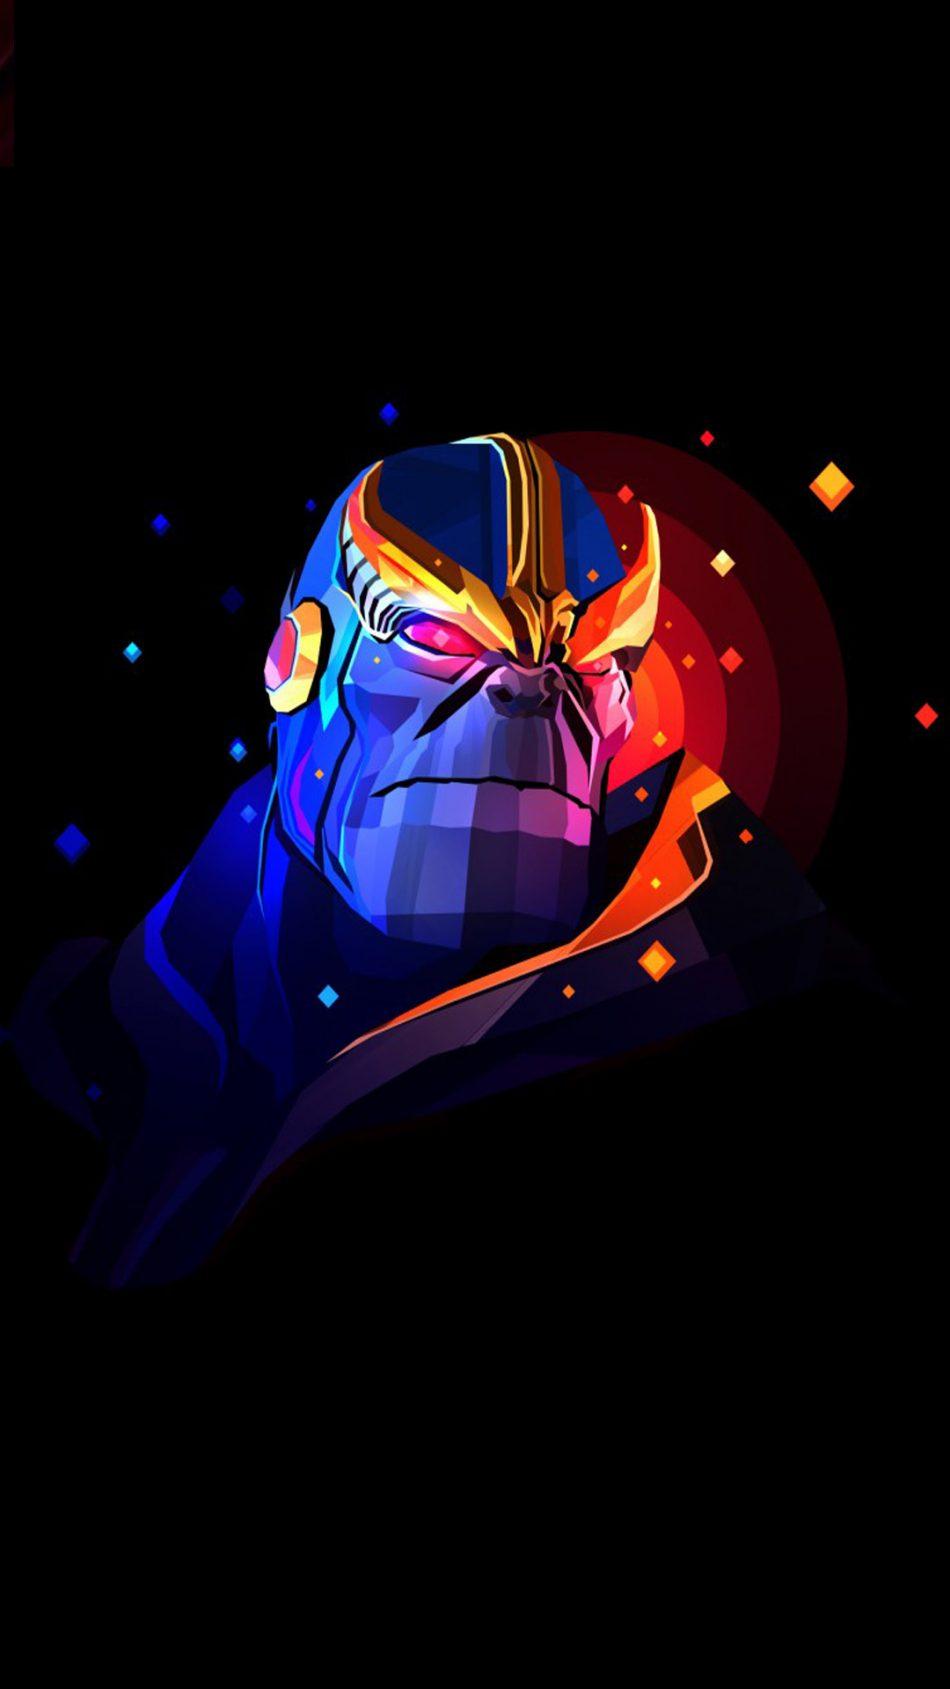 Download Thanos Artwork Free Pure 4K Ultra HD Mobile Wallpaper